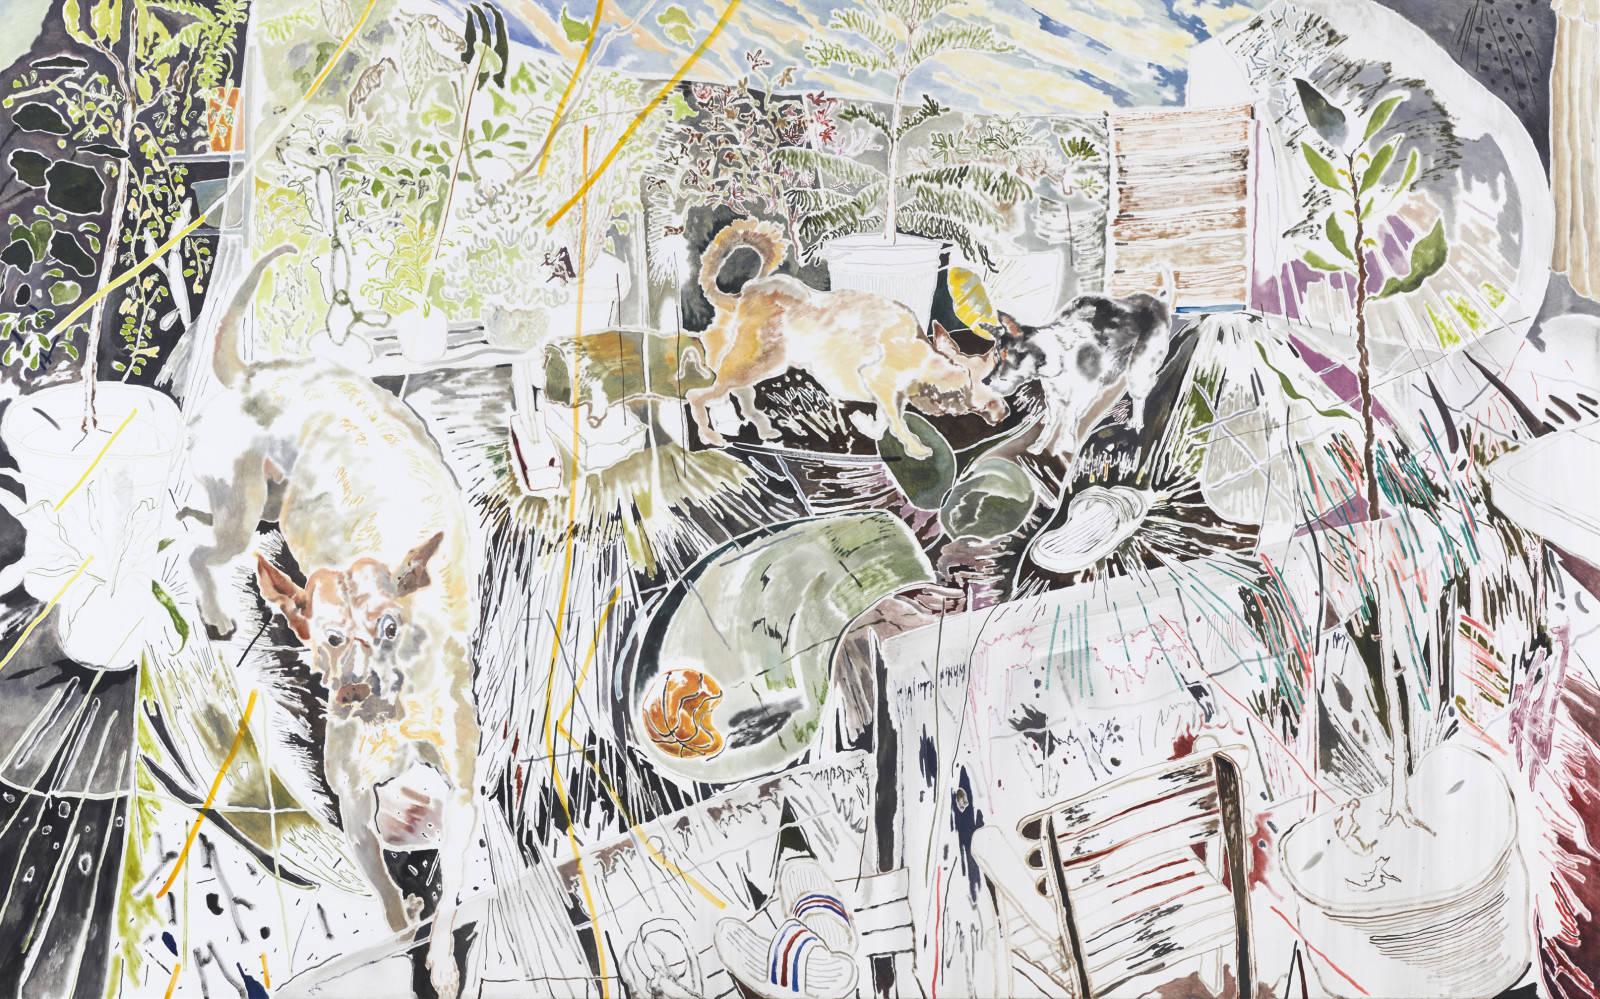 Chris Huen Sin Kan: Puzzled Daydreams at Simon Lee Gallery